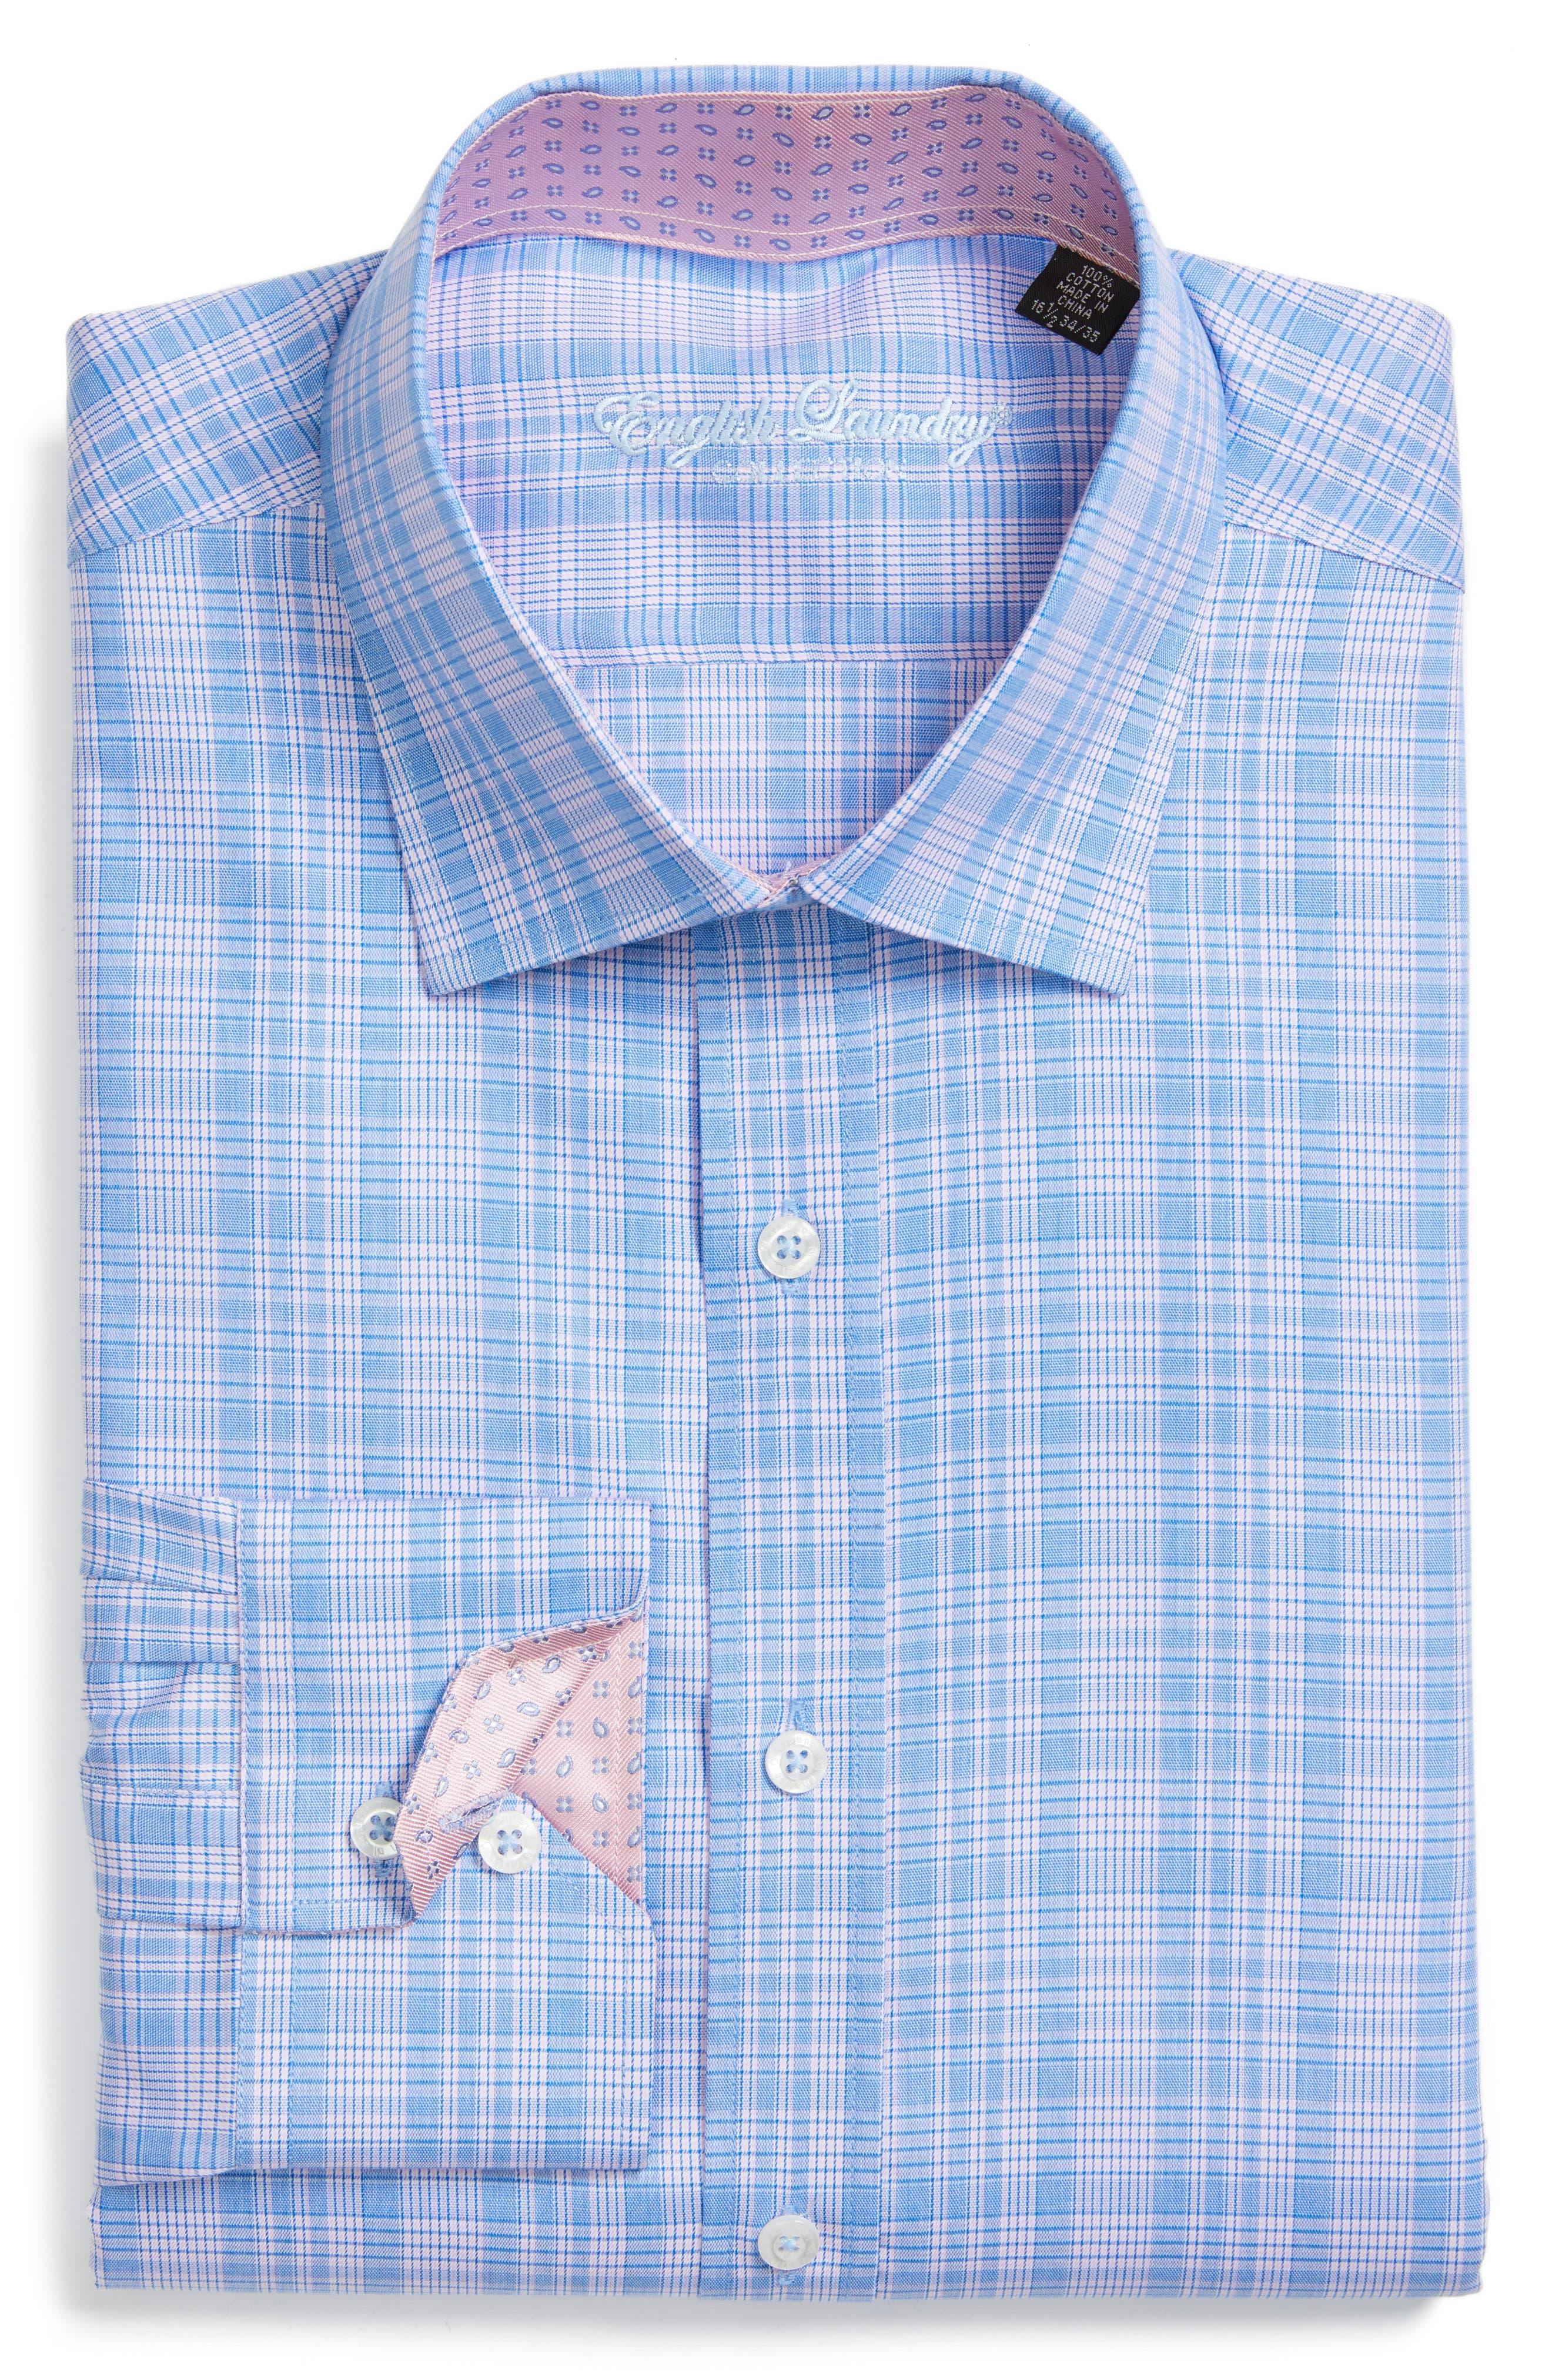 Main Image - English Laundry Trim Fit Plaid Dress Shirt